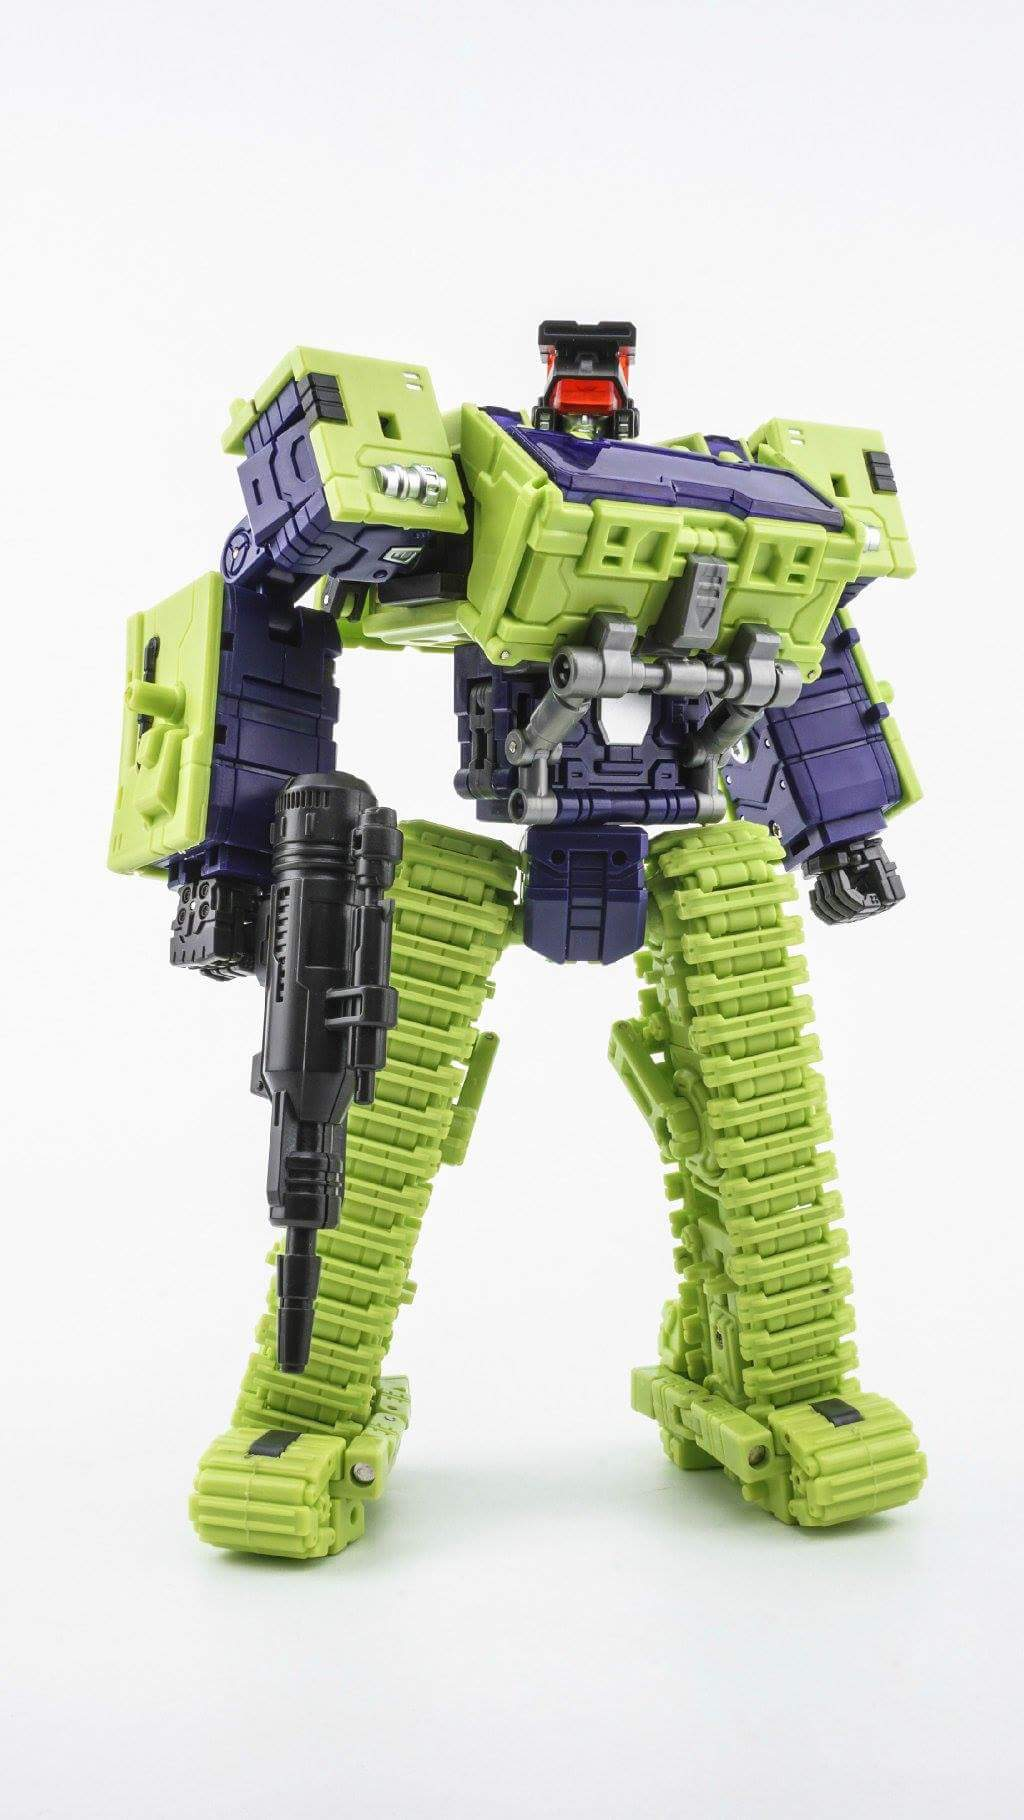 [Toyworld] Produit Tiers - Jouet TW-C Constructor aka Devastator/Dévastateur (Version vert G1 et jaune G2) - Page 3 BjYVTUFn